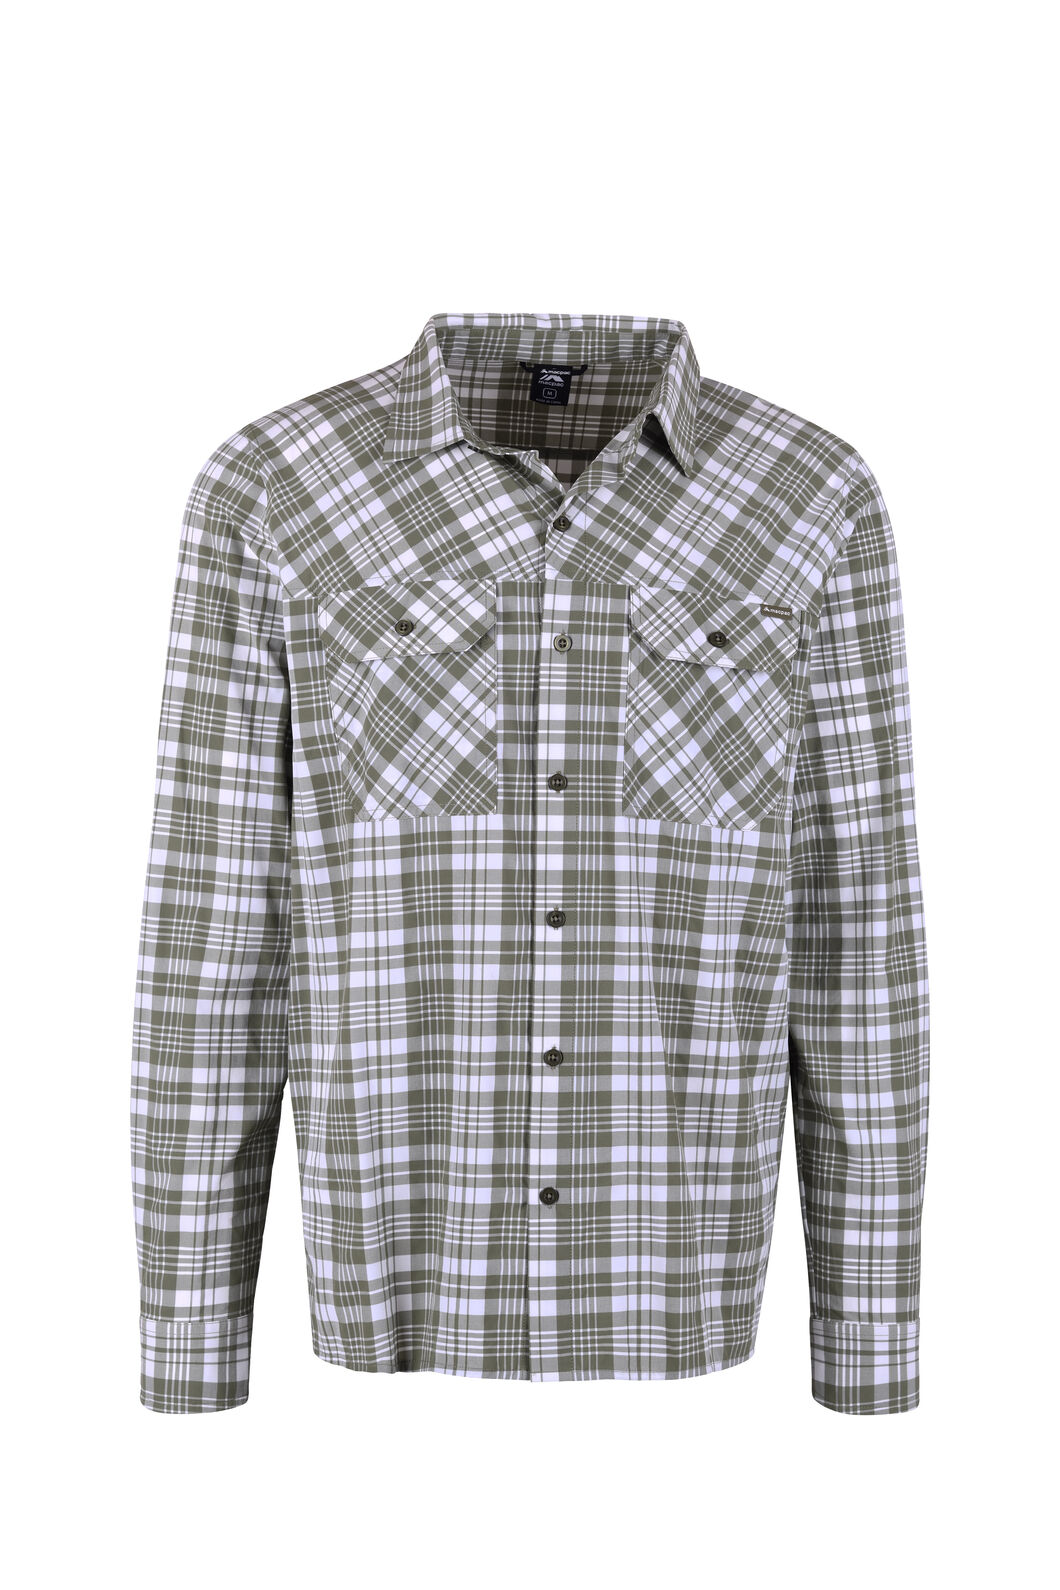 Macpac Eclipse Long Sleeve Shirt — Men's, Olivine, hi-res